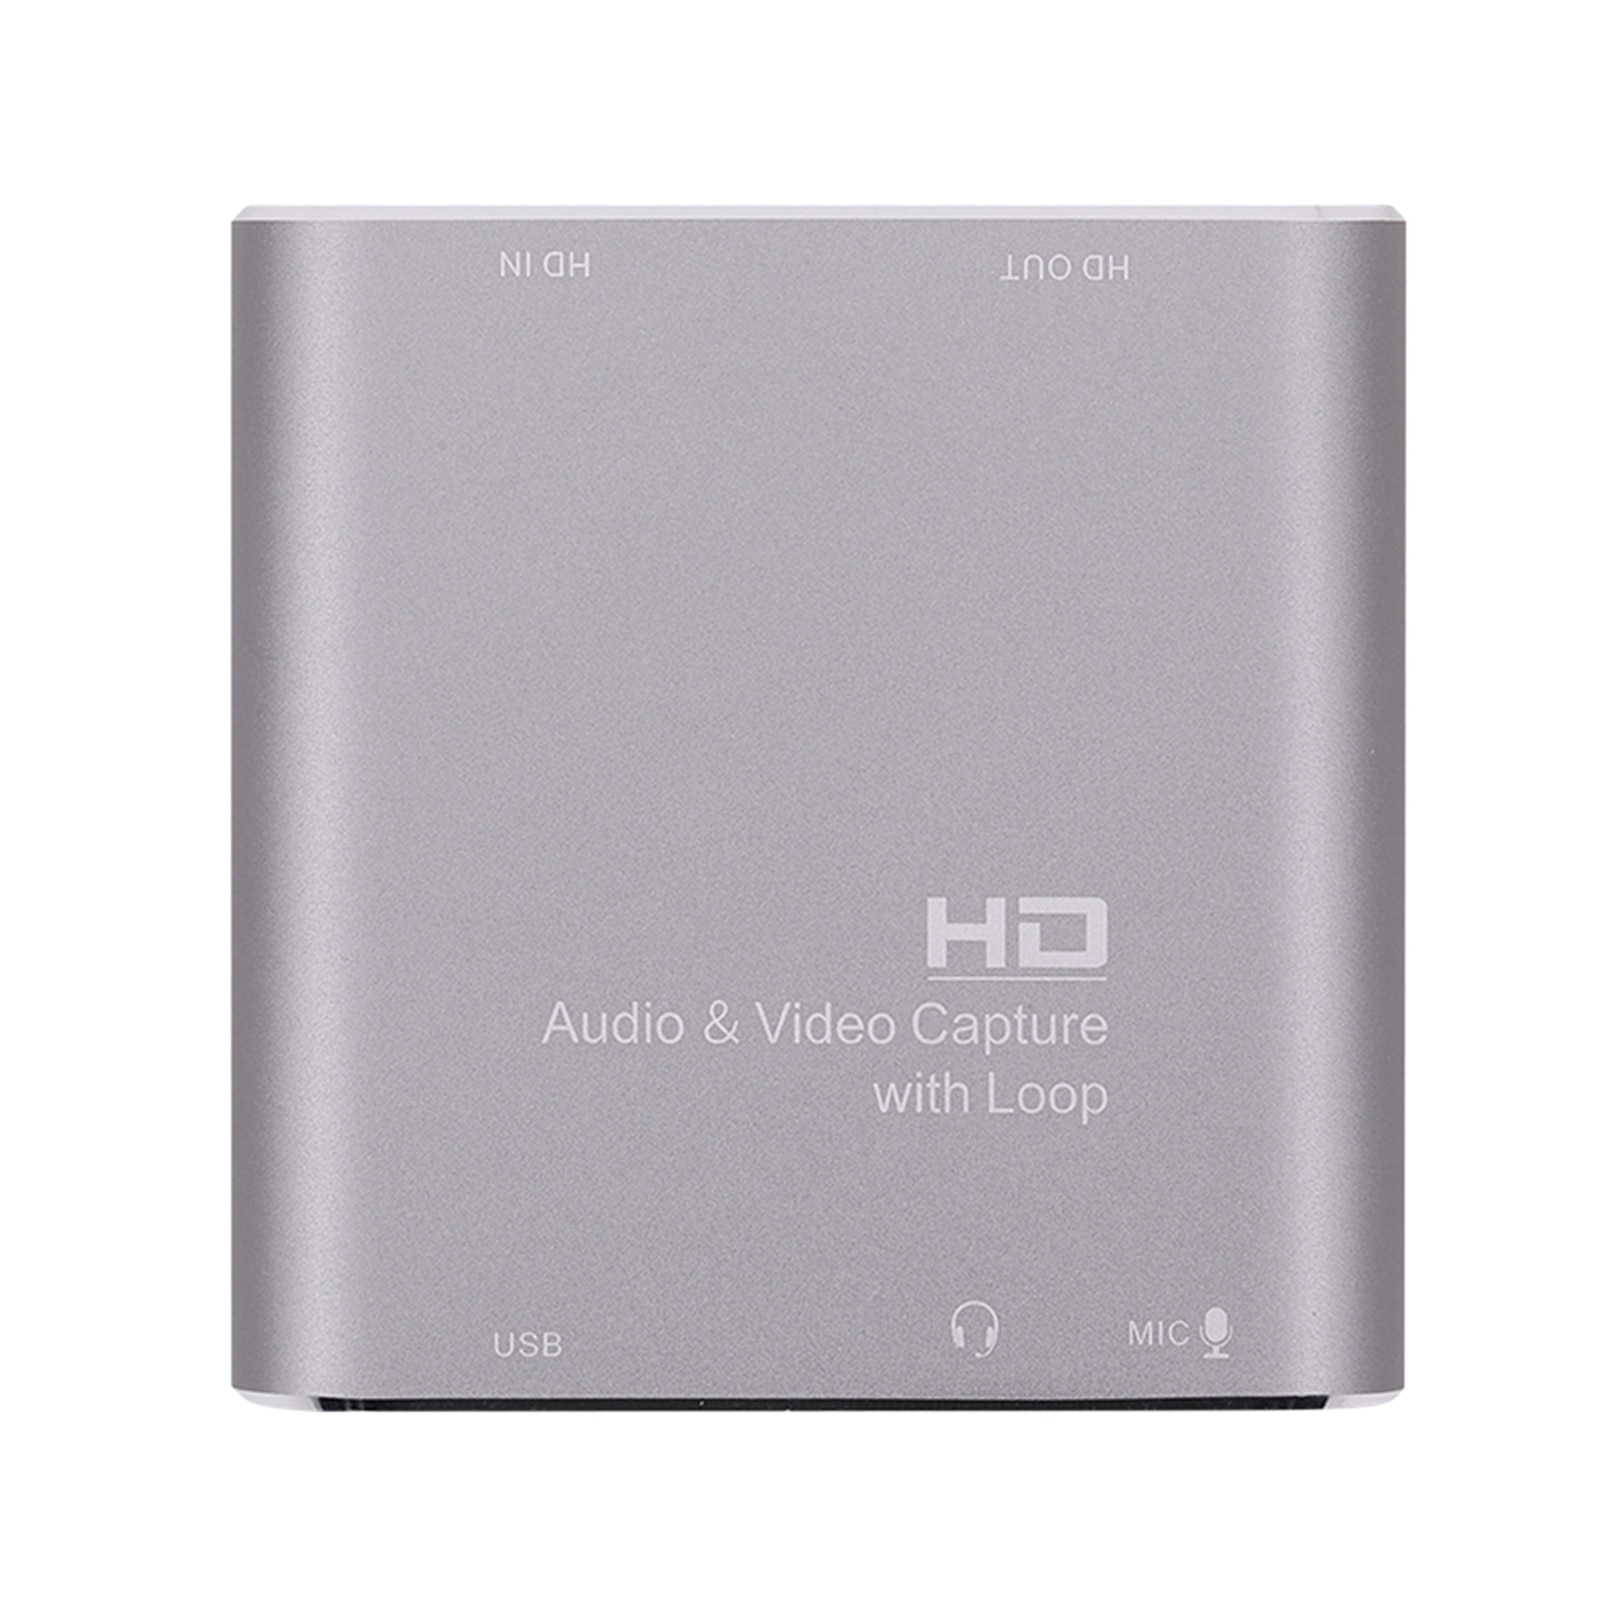 Usb 3.0-بطاقة فيديو 4K عبر الإنترنت للألعاب ، وتدريس صوتي عبر الإنترنت ، وكاميرا فيديو DVD ، وميكروفون 1080P 60 إطارًا في الثانية